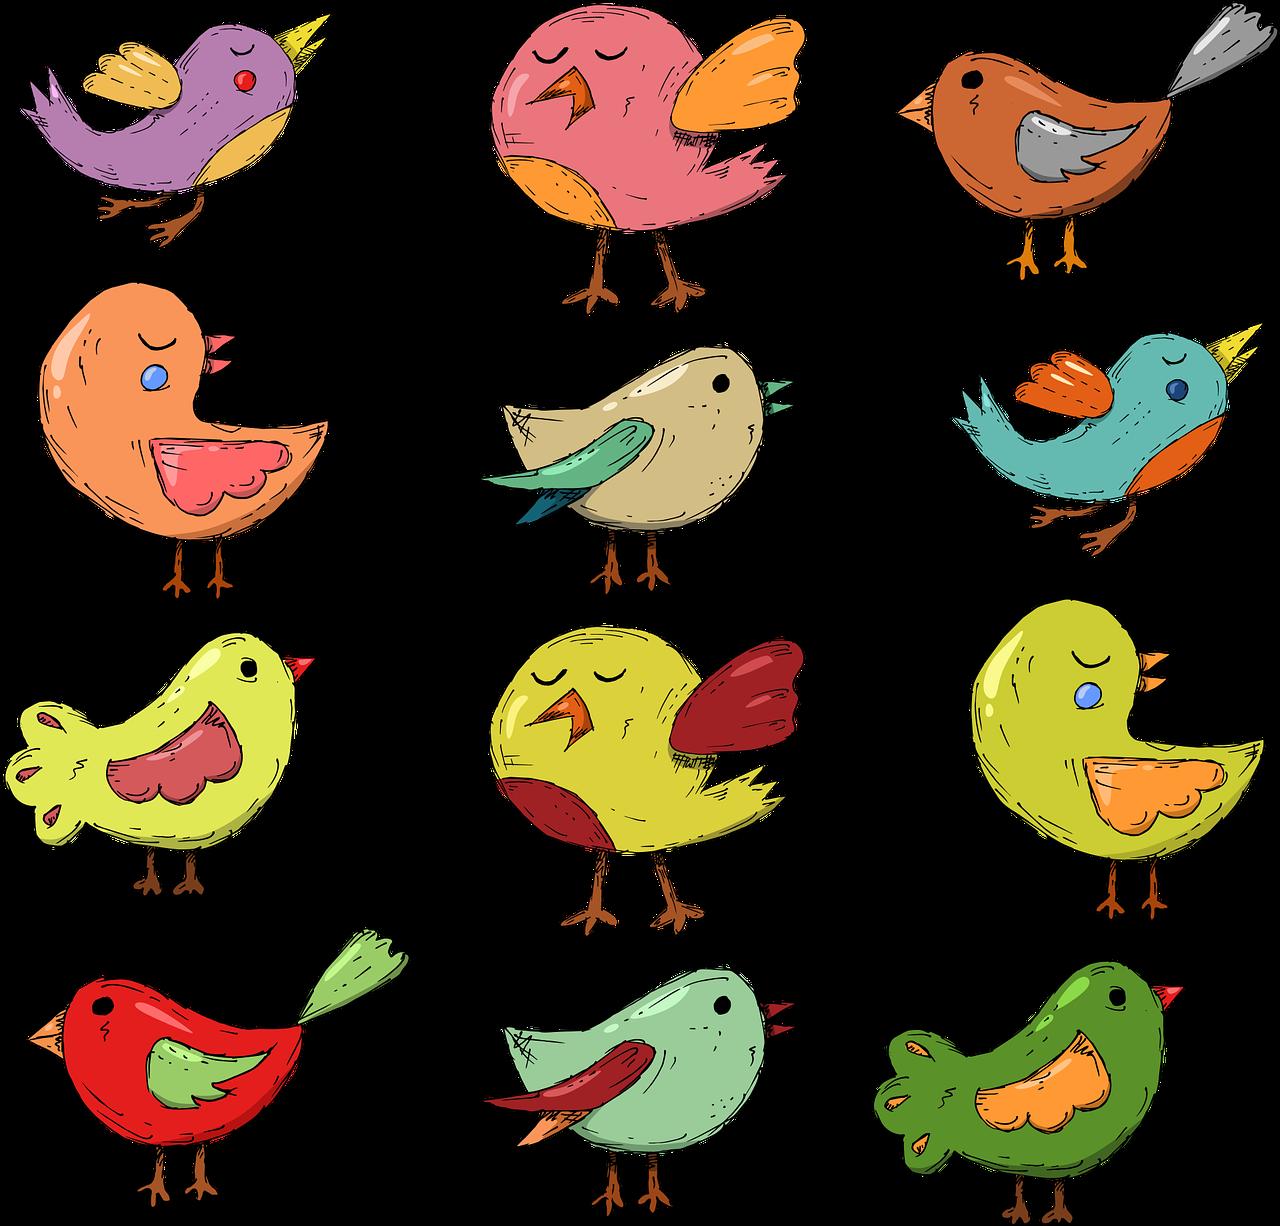 The birds will always sing, even when noone is listening